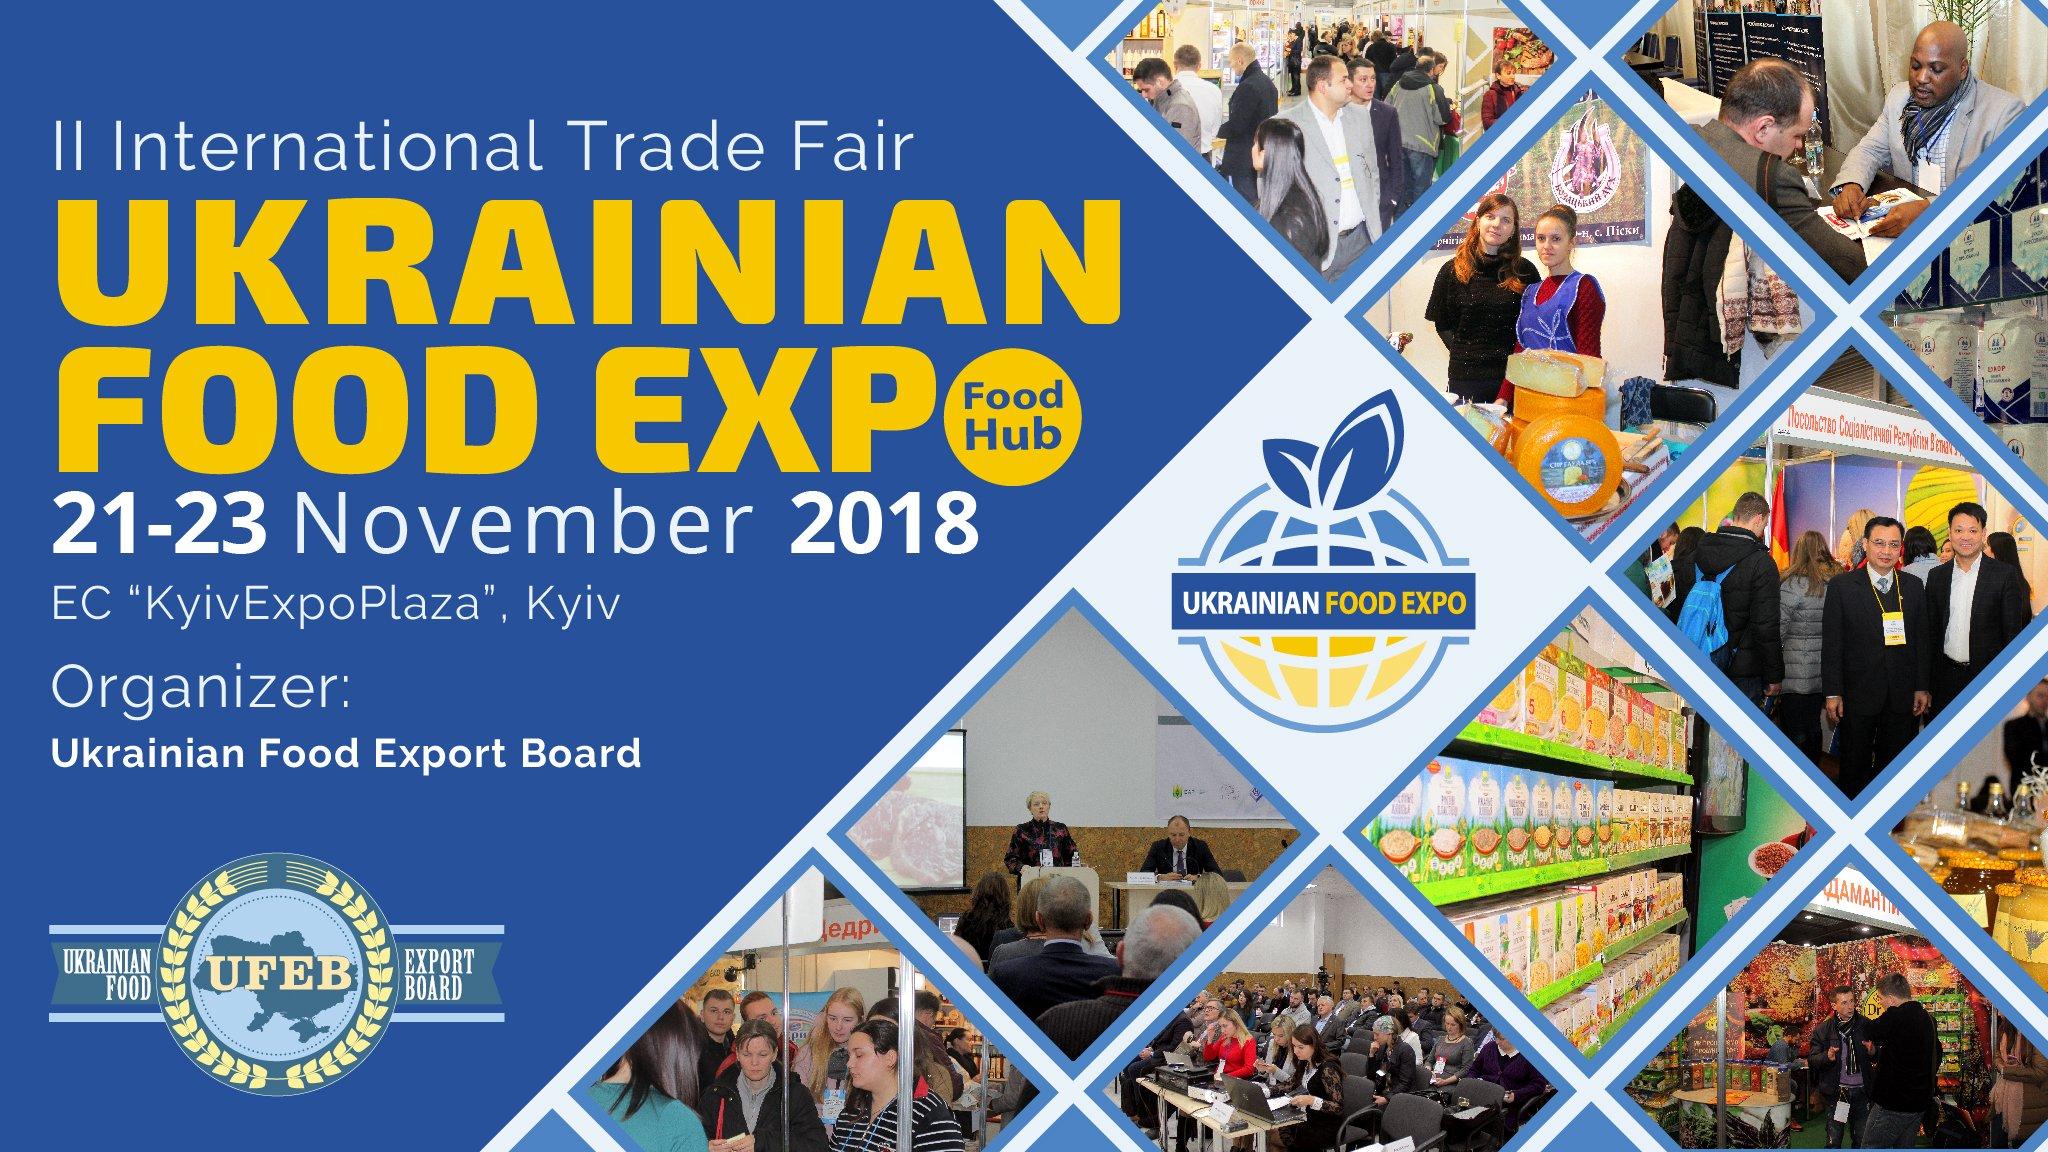 Embassy Of Ukraine In Egypt On Twitter Ukrainian Food Expo 2018 Ii International Trade Fair 21 23 November 2018 Exhibition Center Kyivexpoplaza Https T Co Wqtdhtsaxo Https T Co Joguz18jov